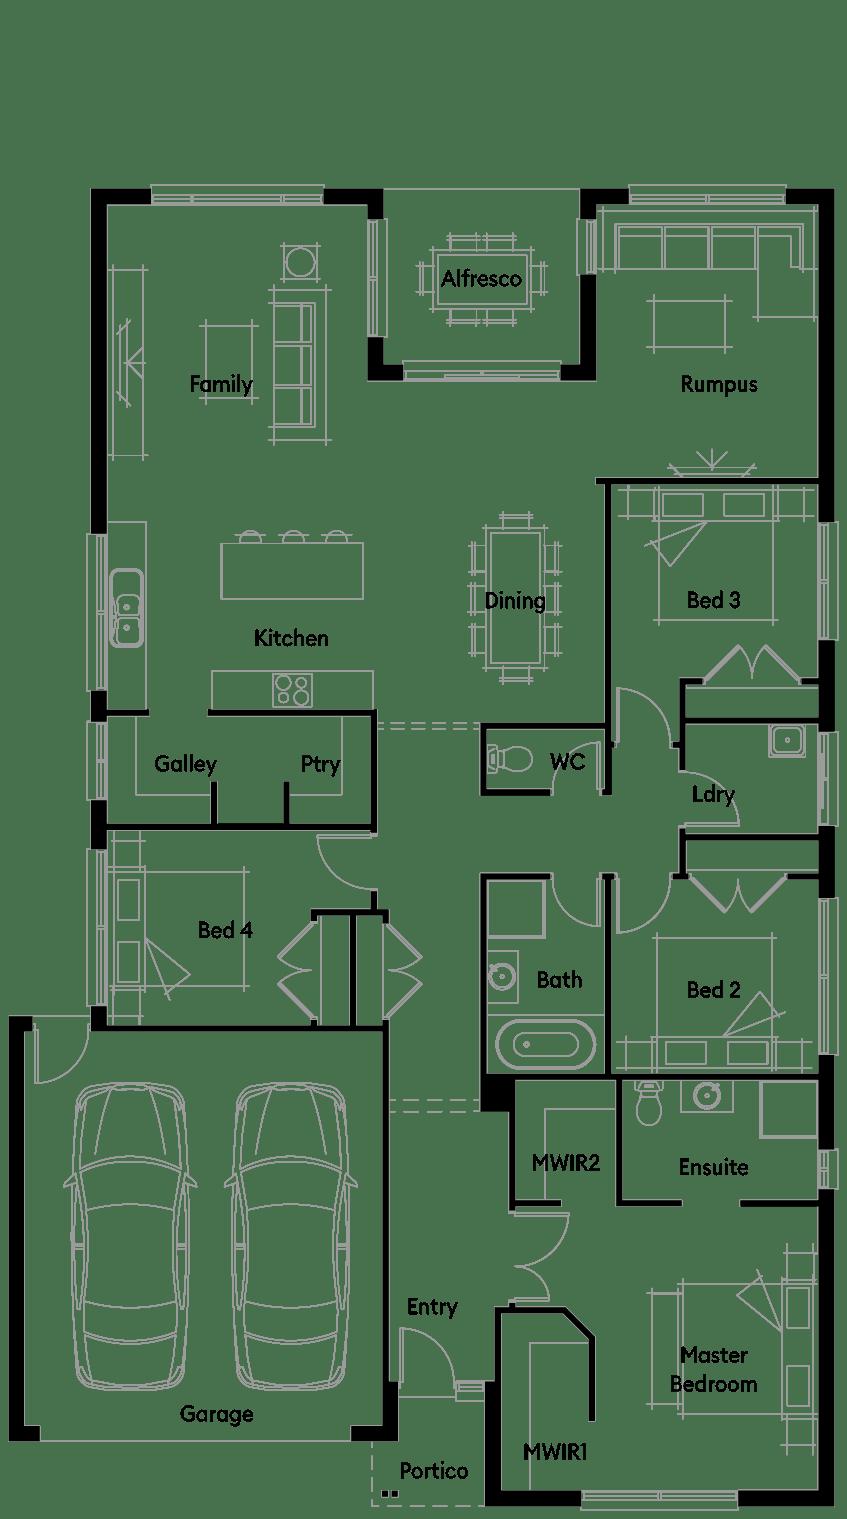 FloorPlan1_HOUSE761_Liverpool_25-14